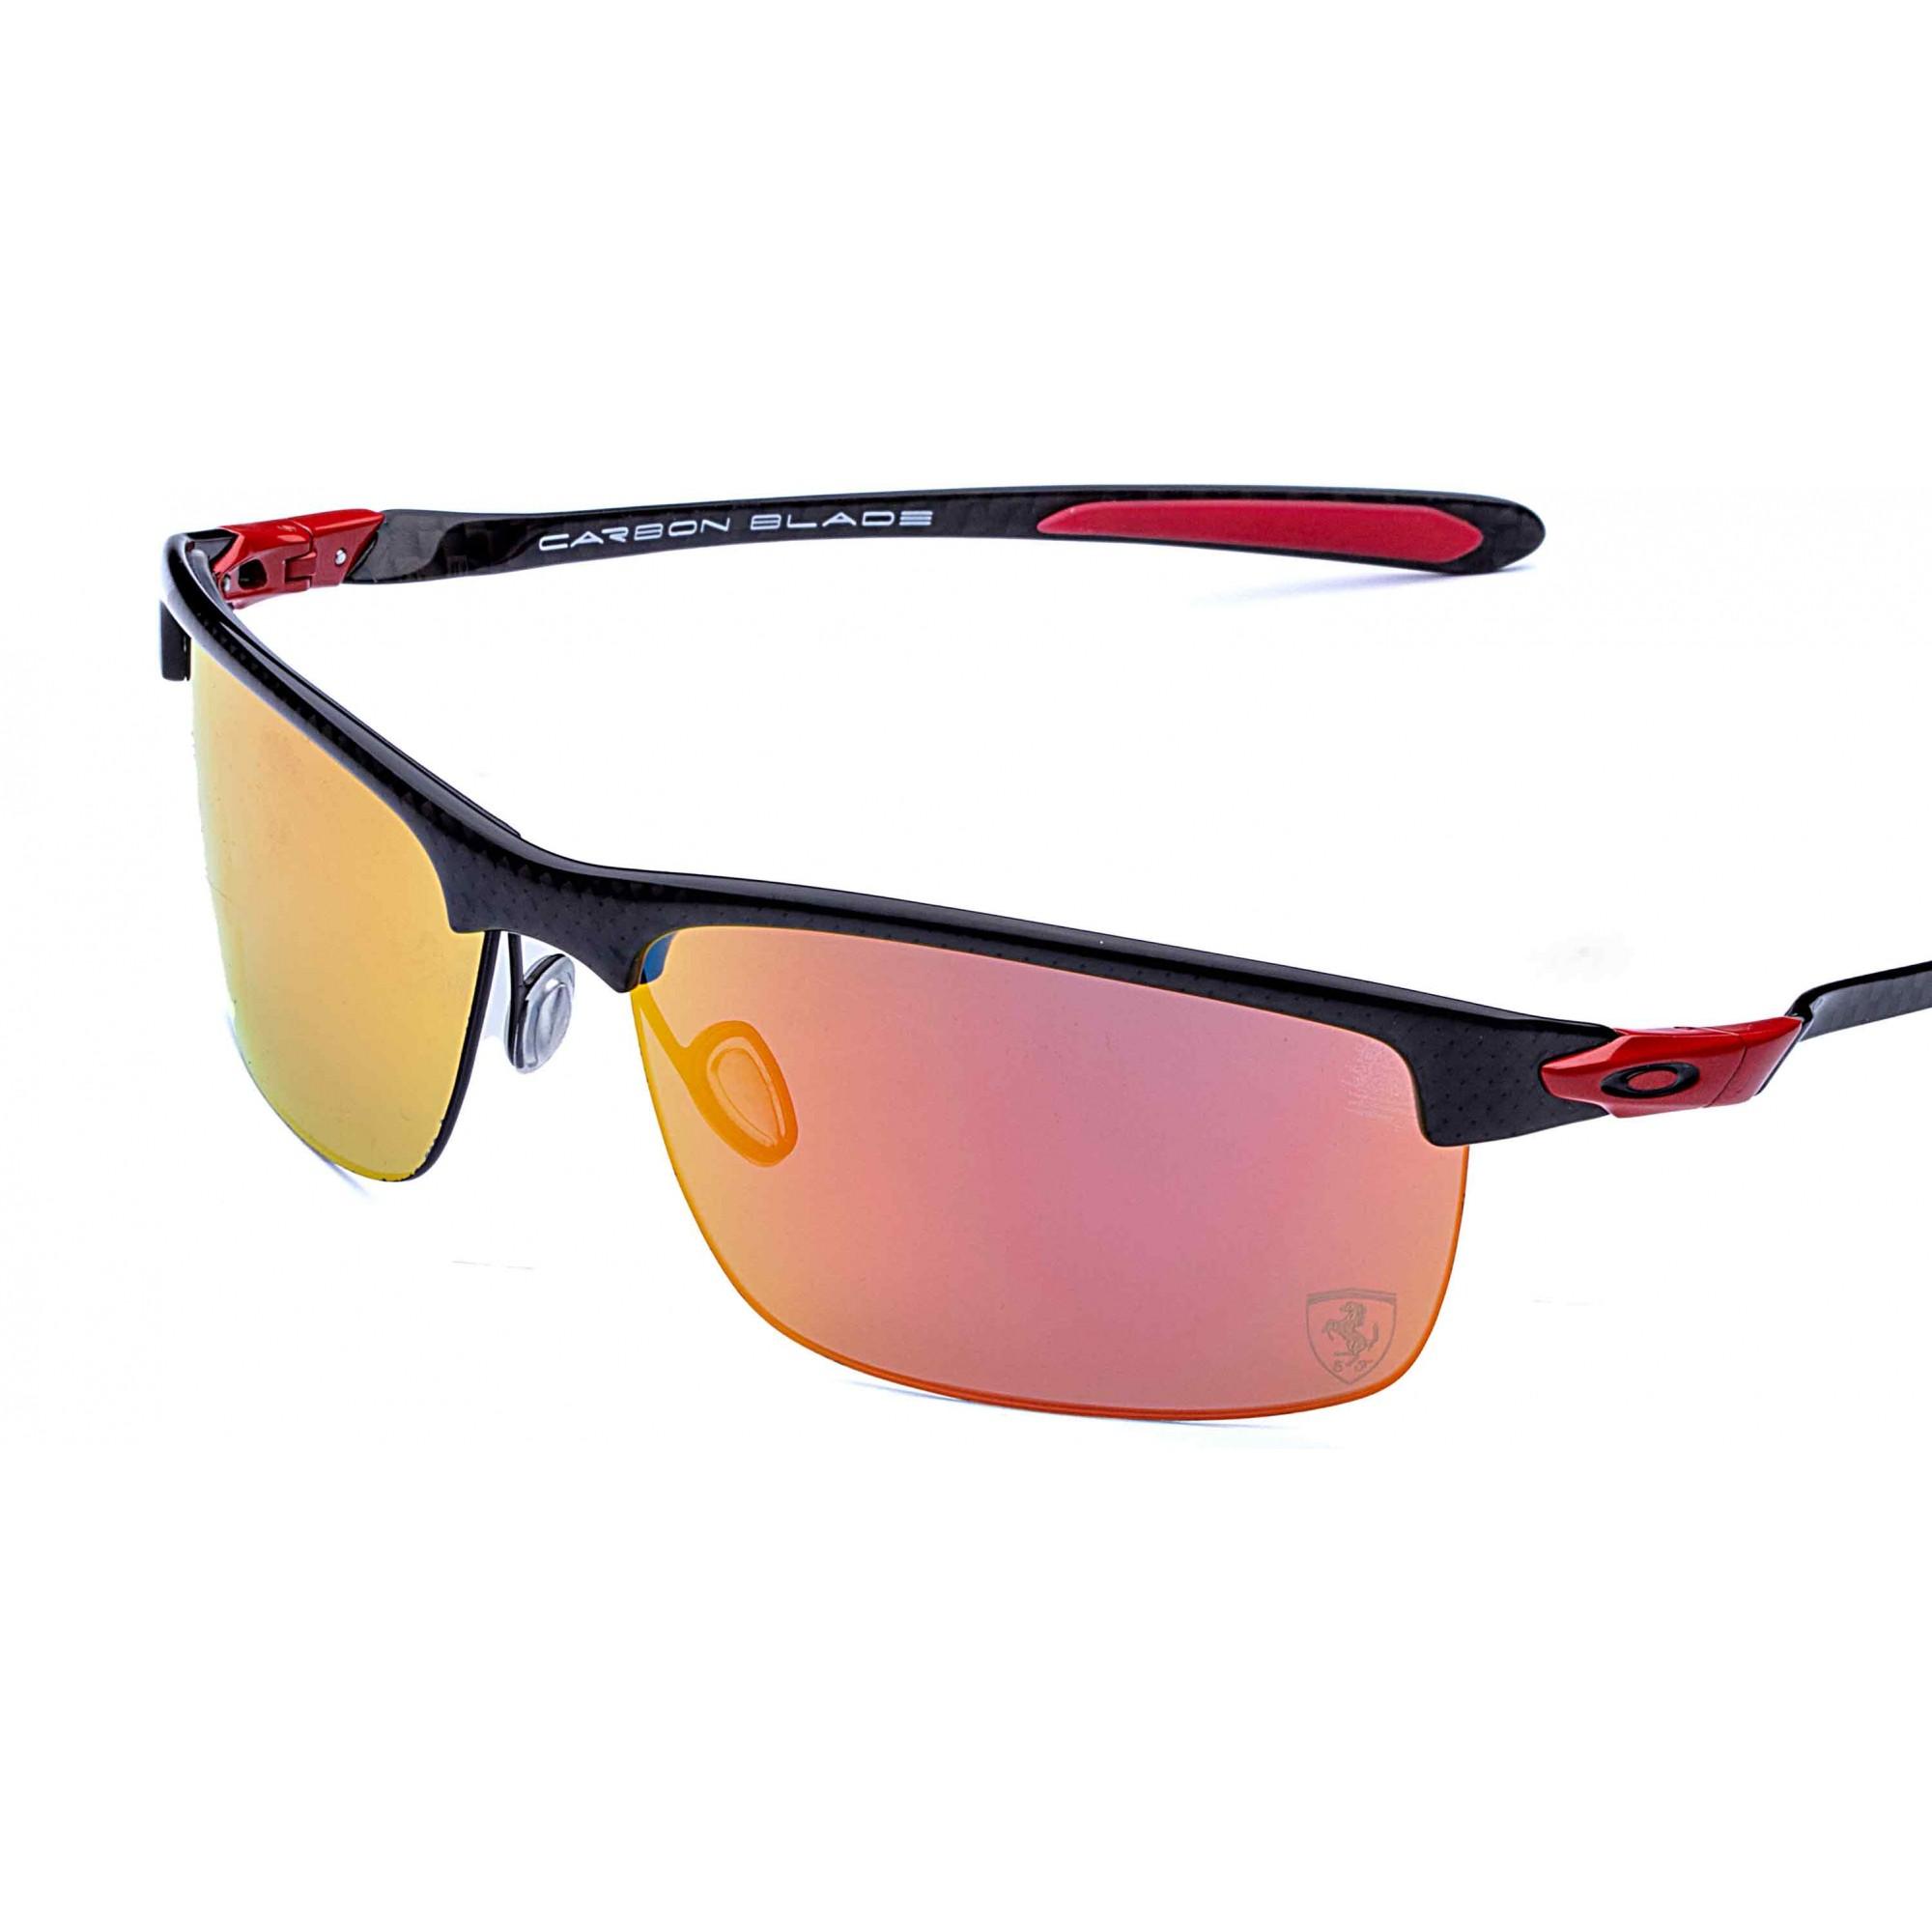 Óculos de Sol Carbon Blade Ferrari Oakley